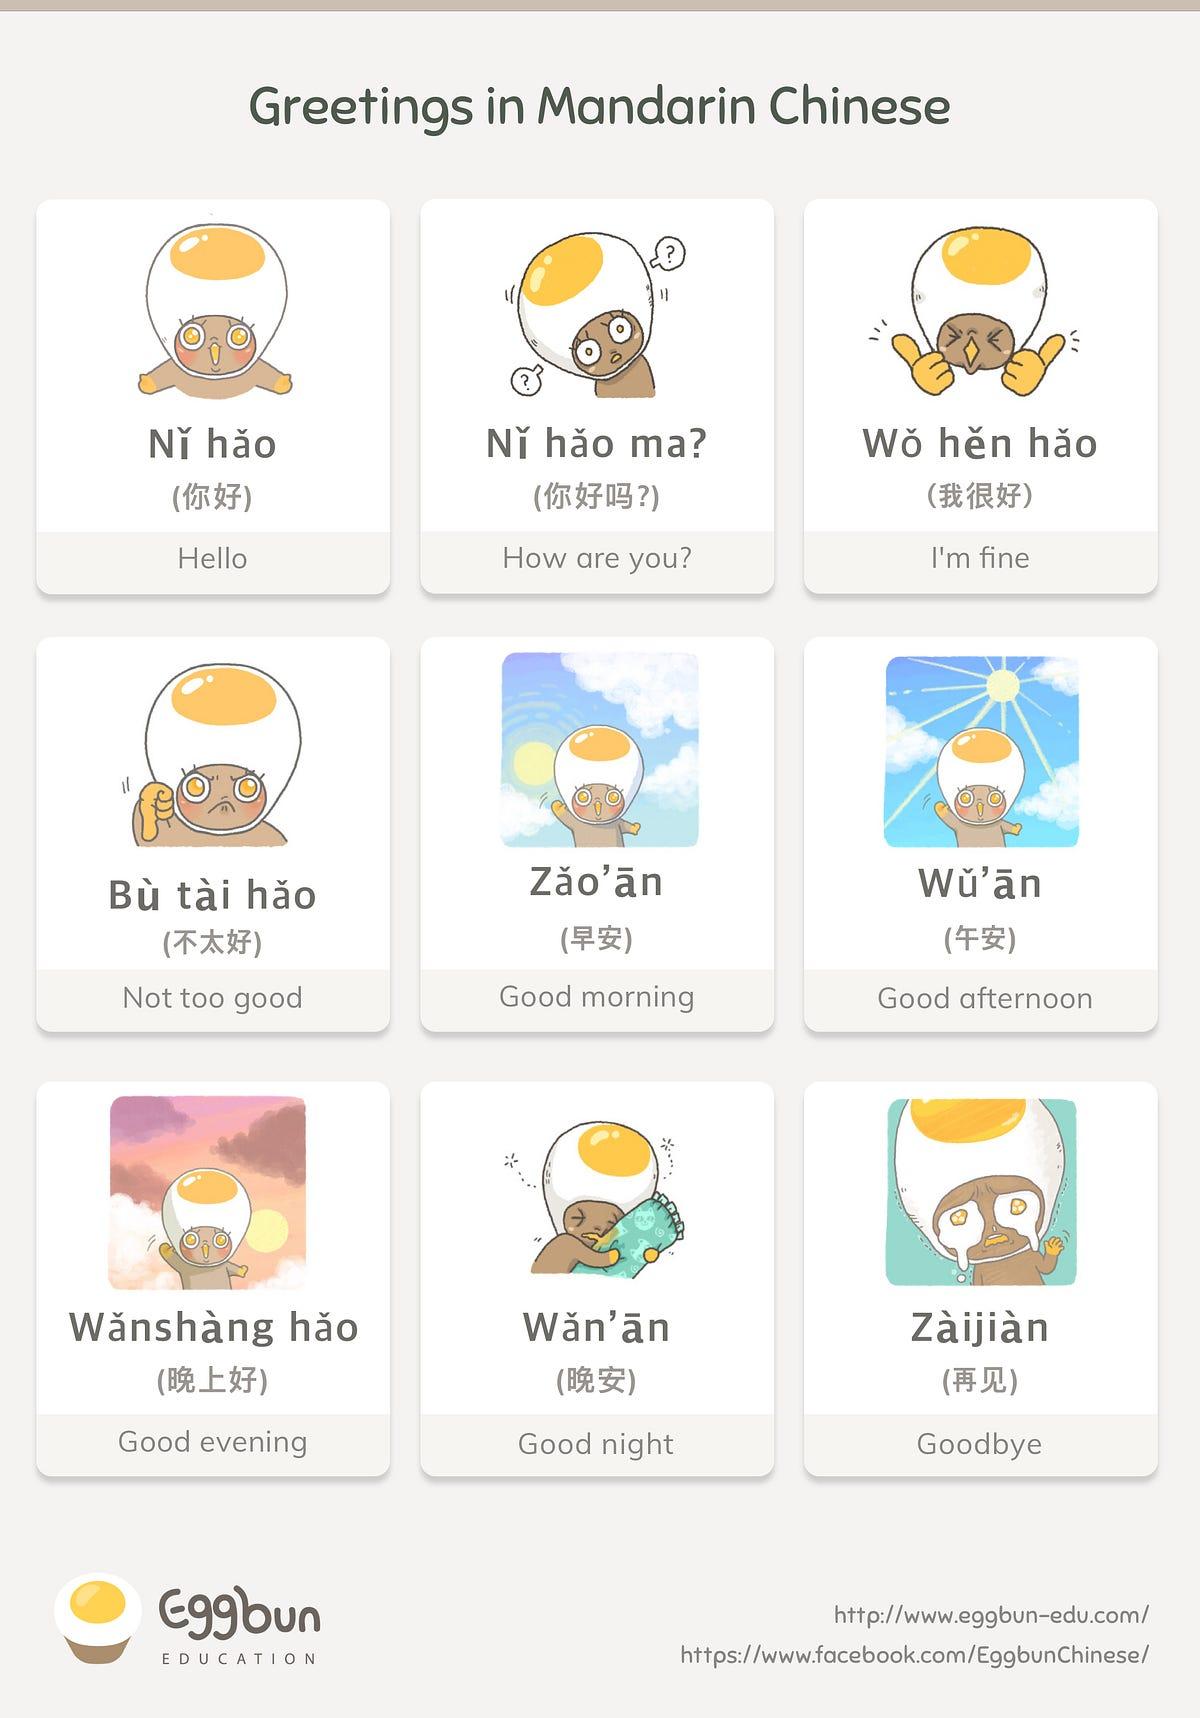 Basic Greetings In Mandarin Chinese Story Of Eggbun